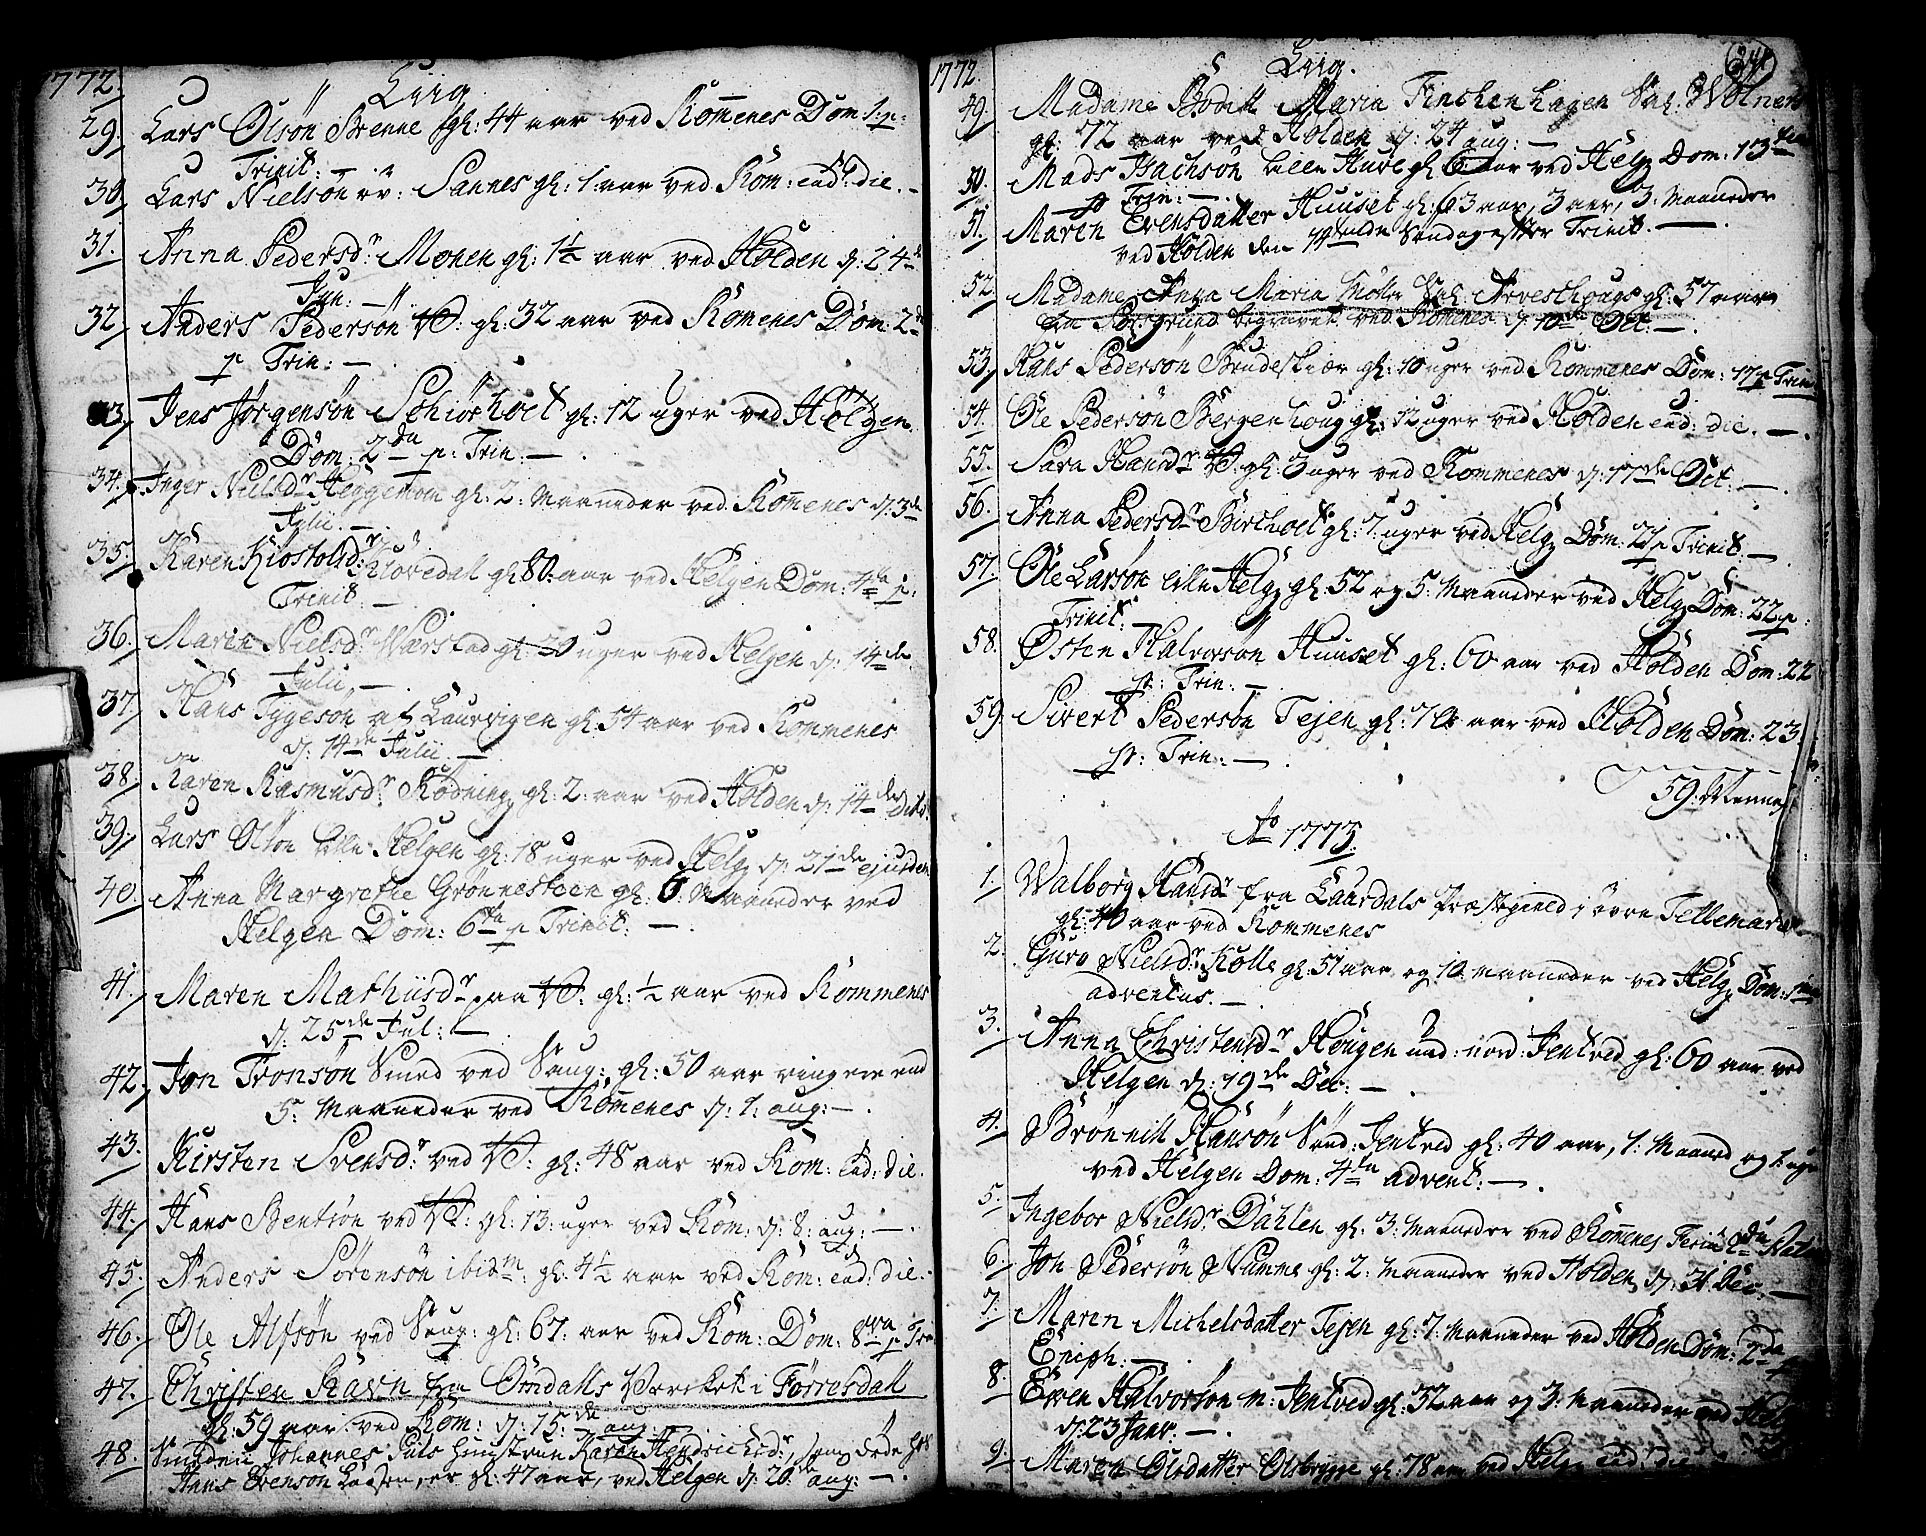 SAKO, Holla kirkebøker, F/Fa/L0001: Ministerialbok nr. 1, 1717-1779, s. 241